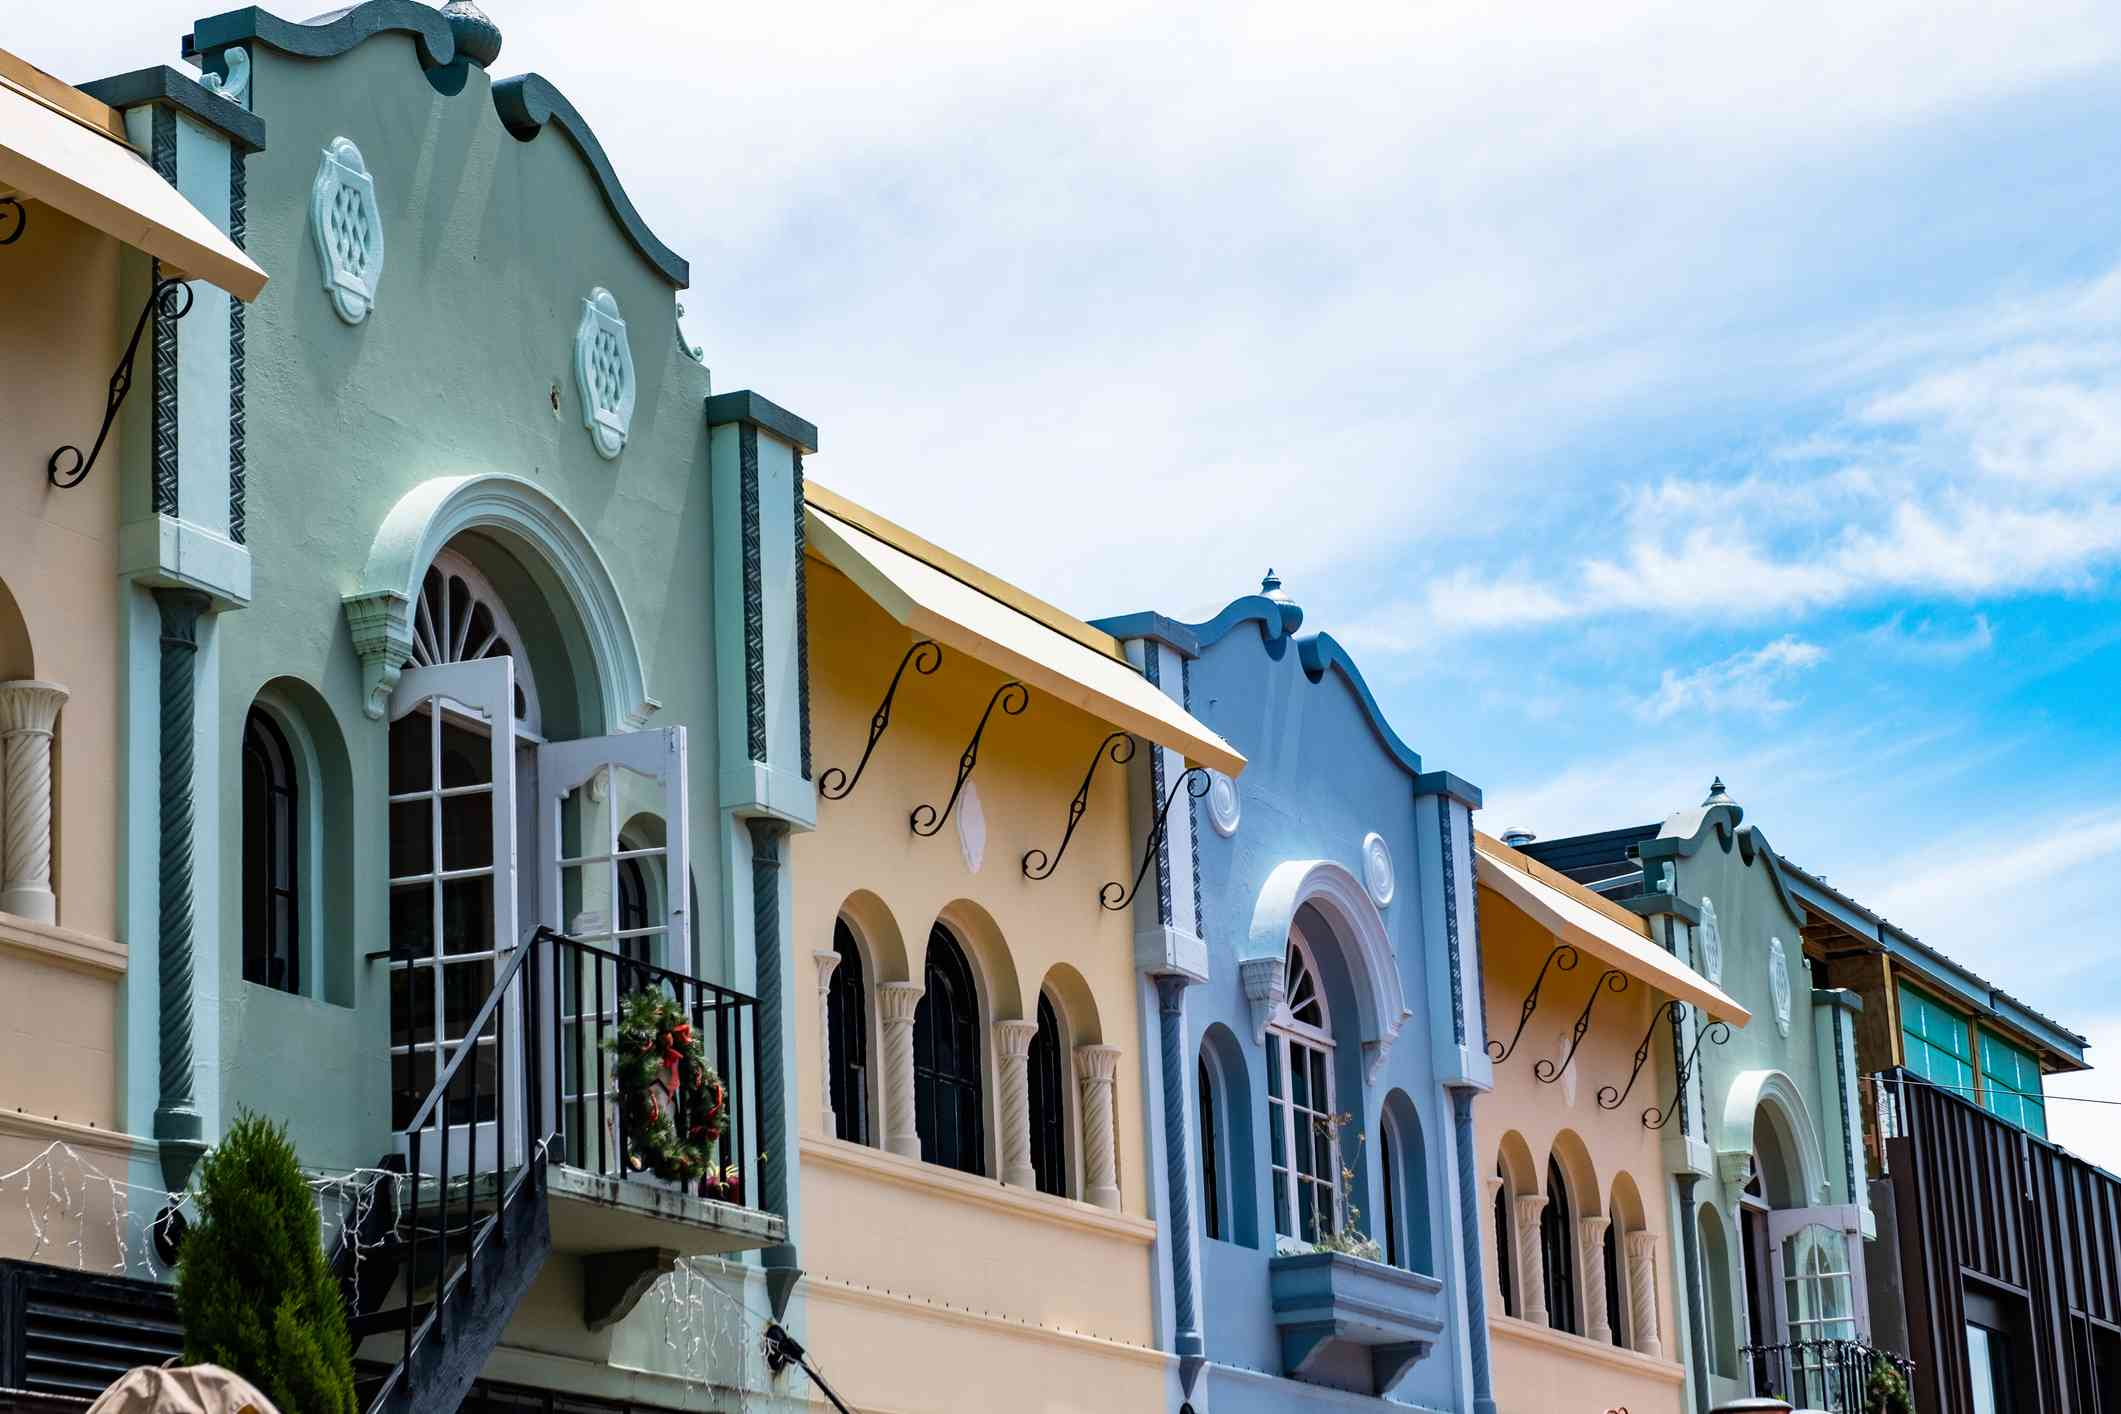 pastel colored colonial-era buildings